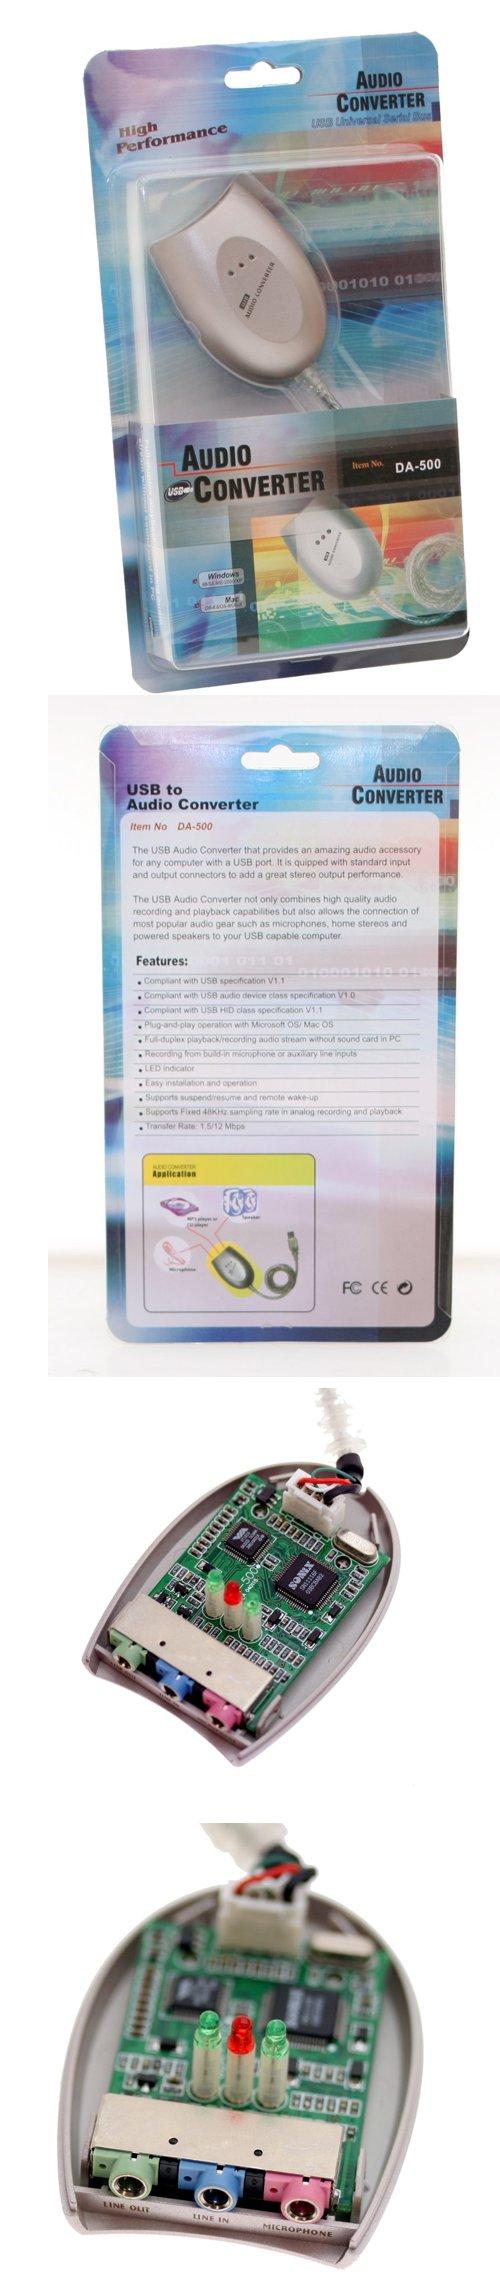 USB Digital to Analog Converter USB Sound Card (Sound Adapter) with Line-Input